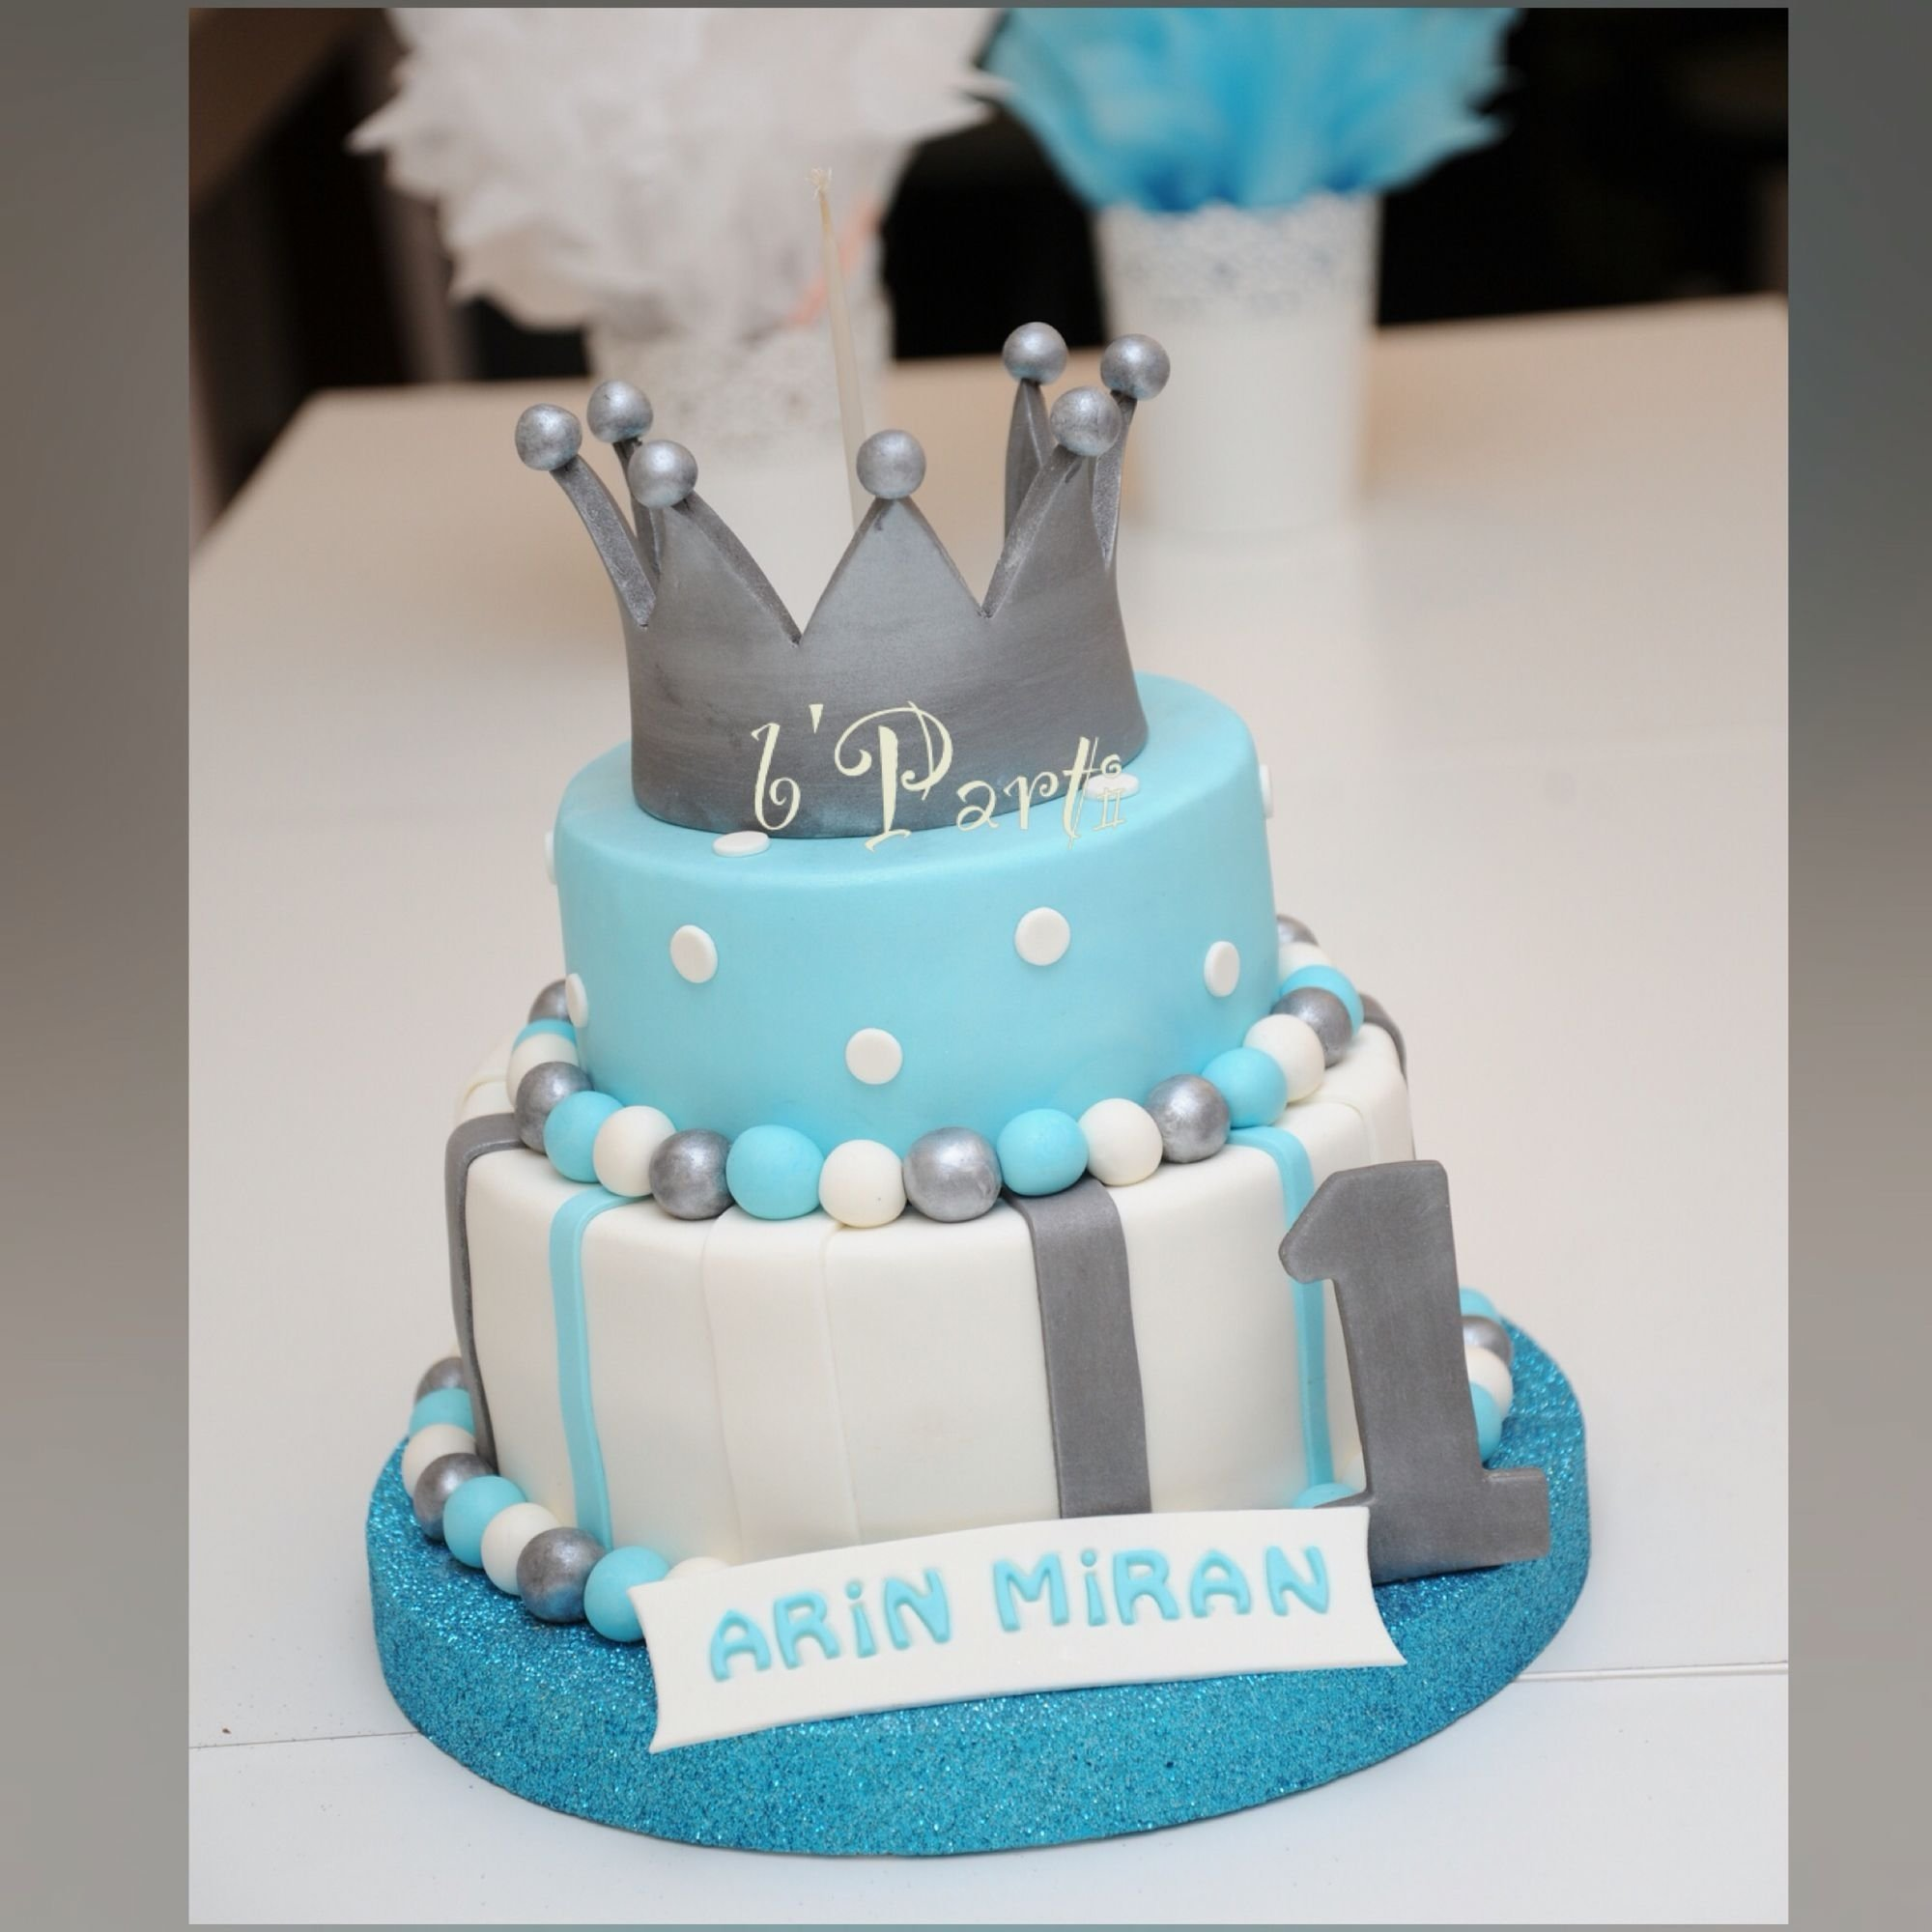 10 Unique First Birthday Cake Ideas Boy baby boy cake first birthday cake regalia cake prince cake 2 2021